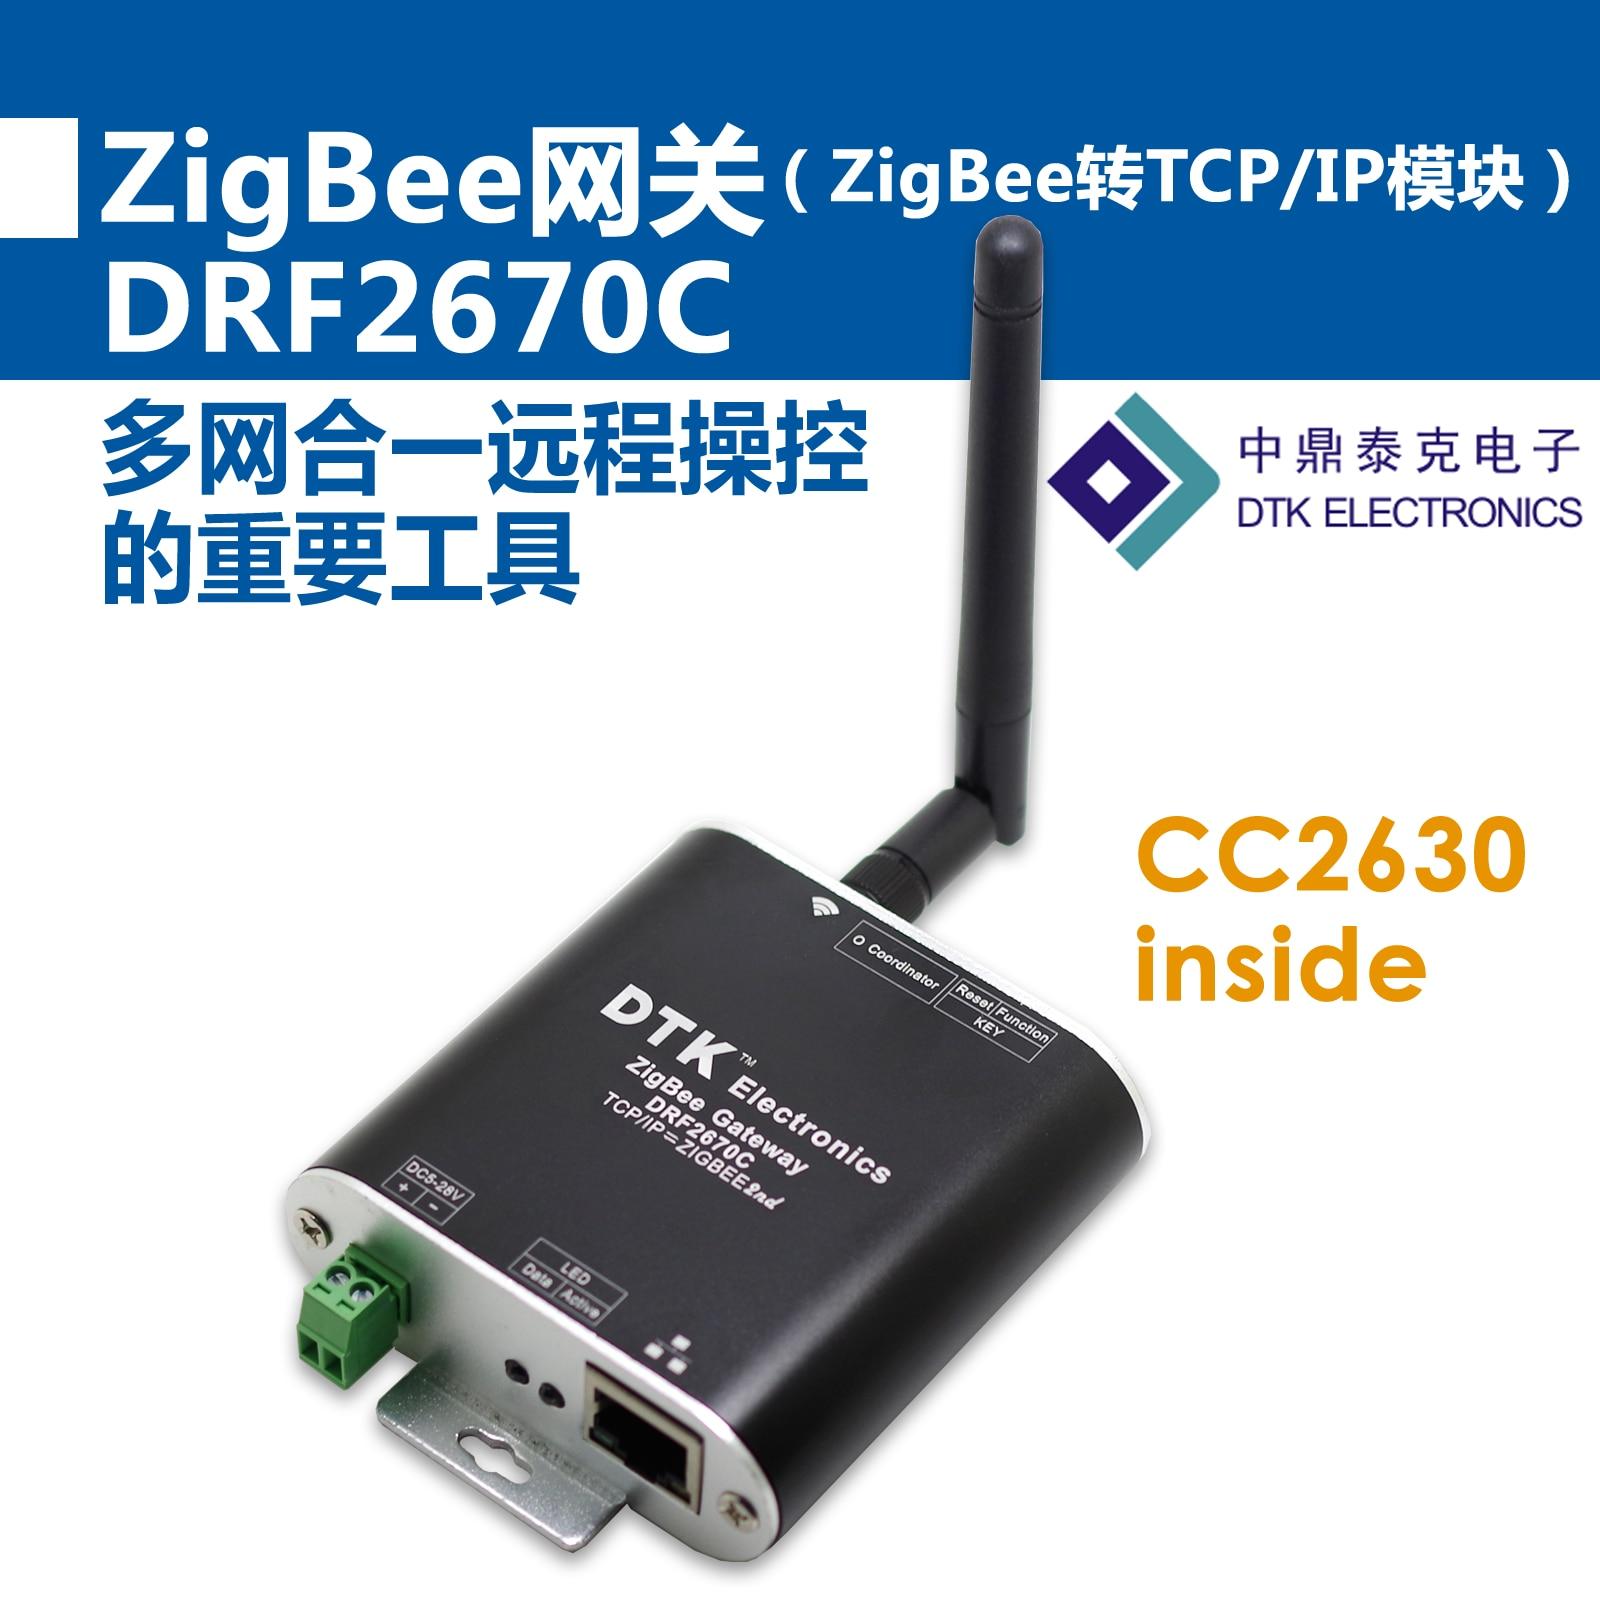 ZigBee gateway, ZigBee to TCP/IP network module, built-in CC2630 chip, far exceeding CC2530